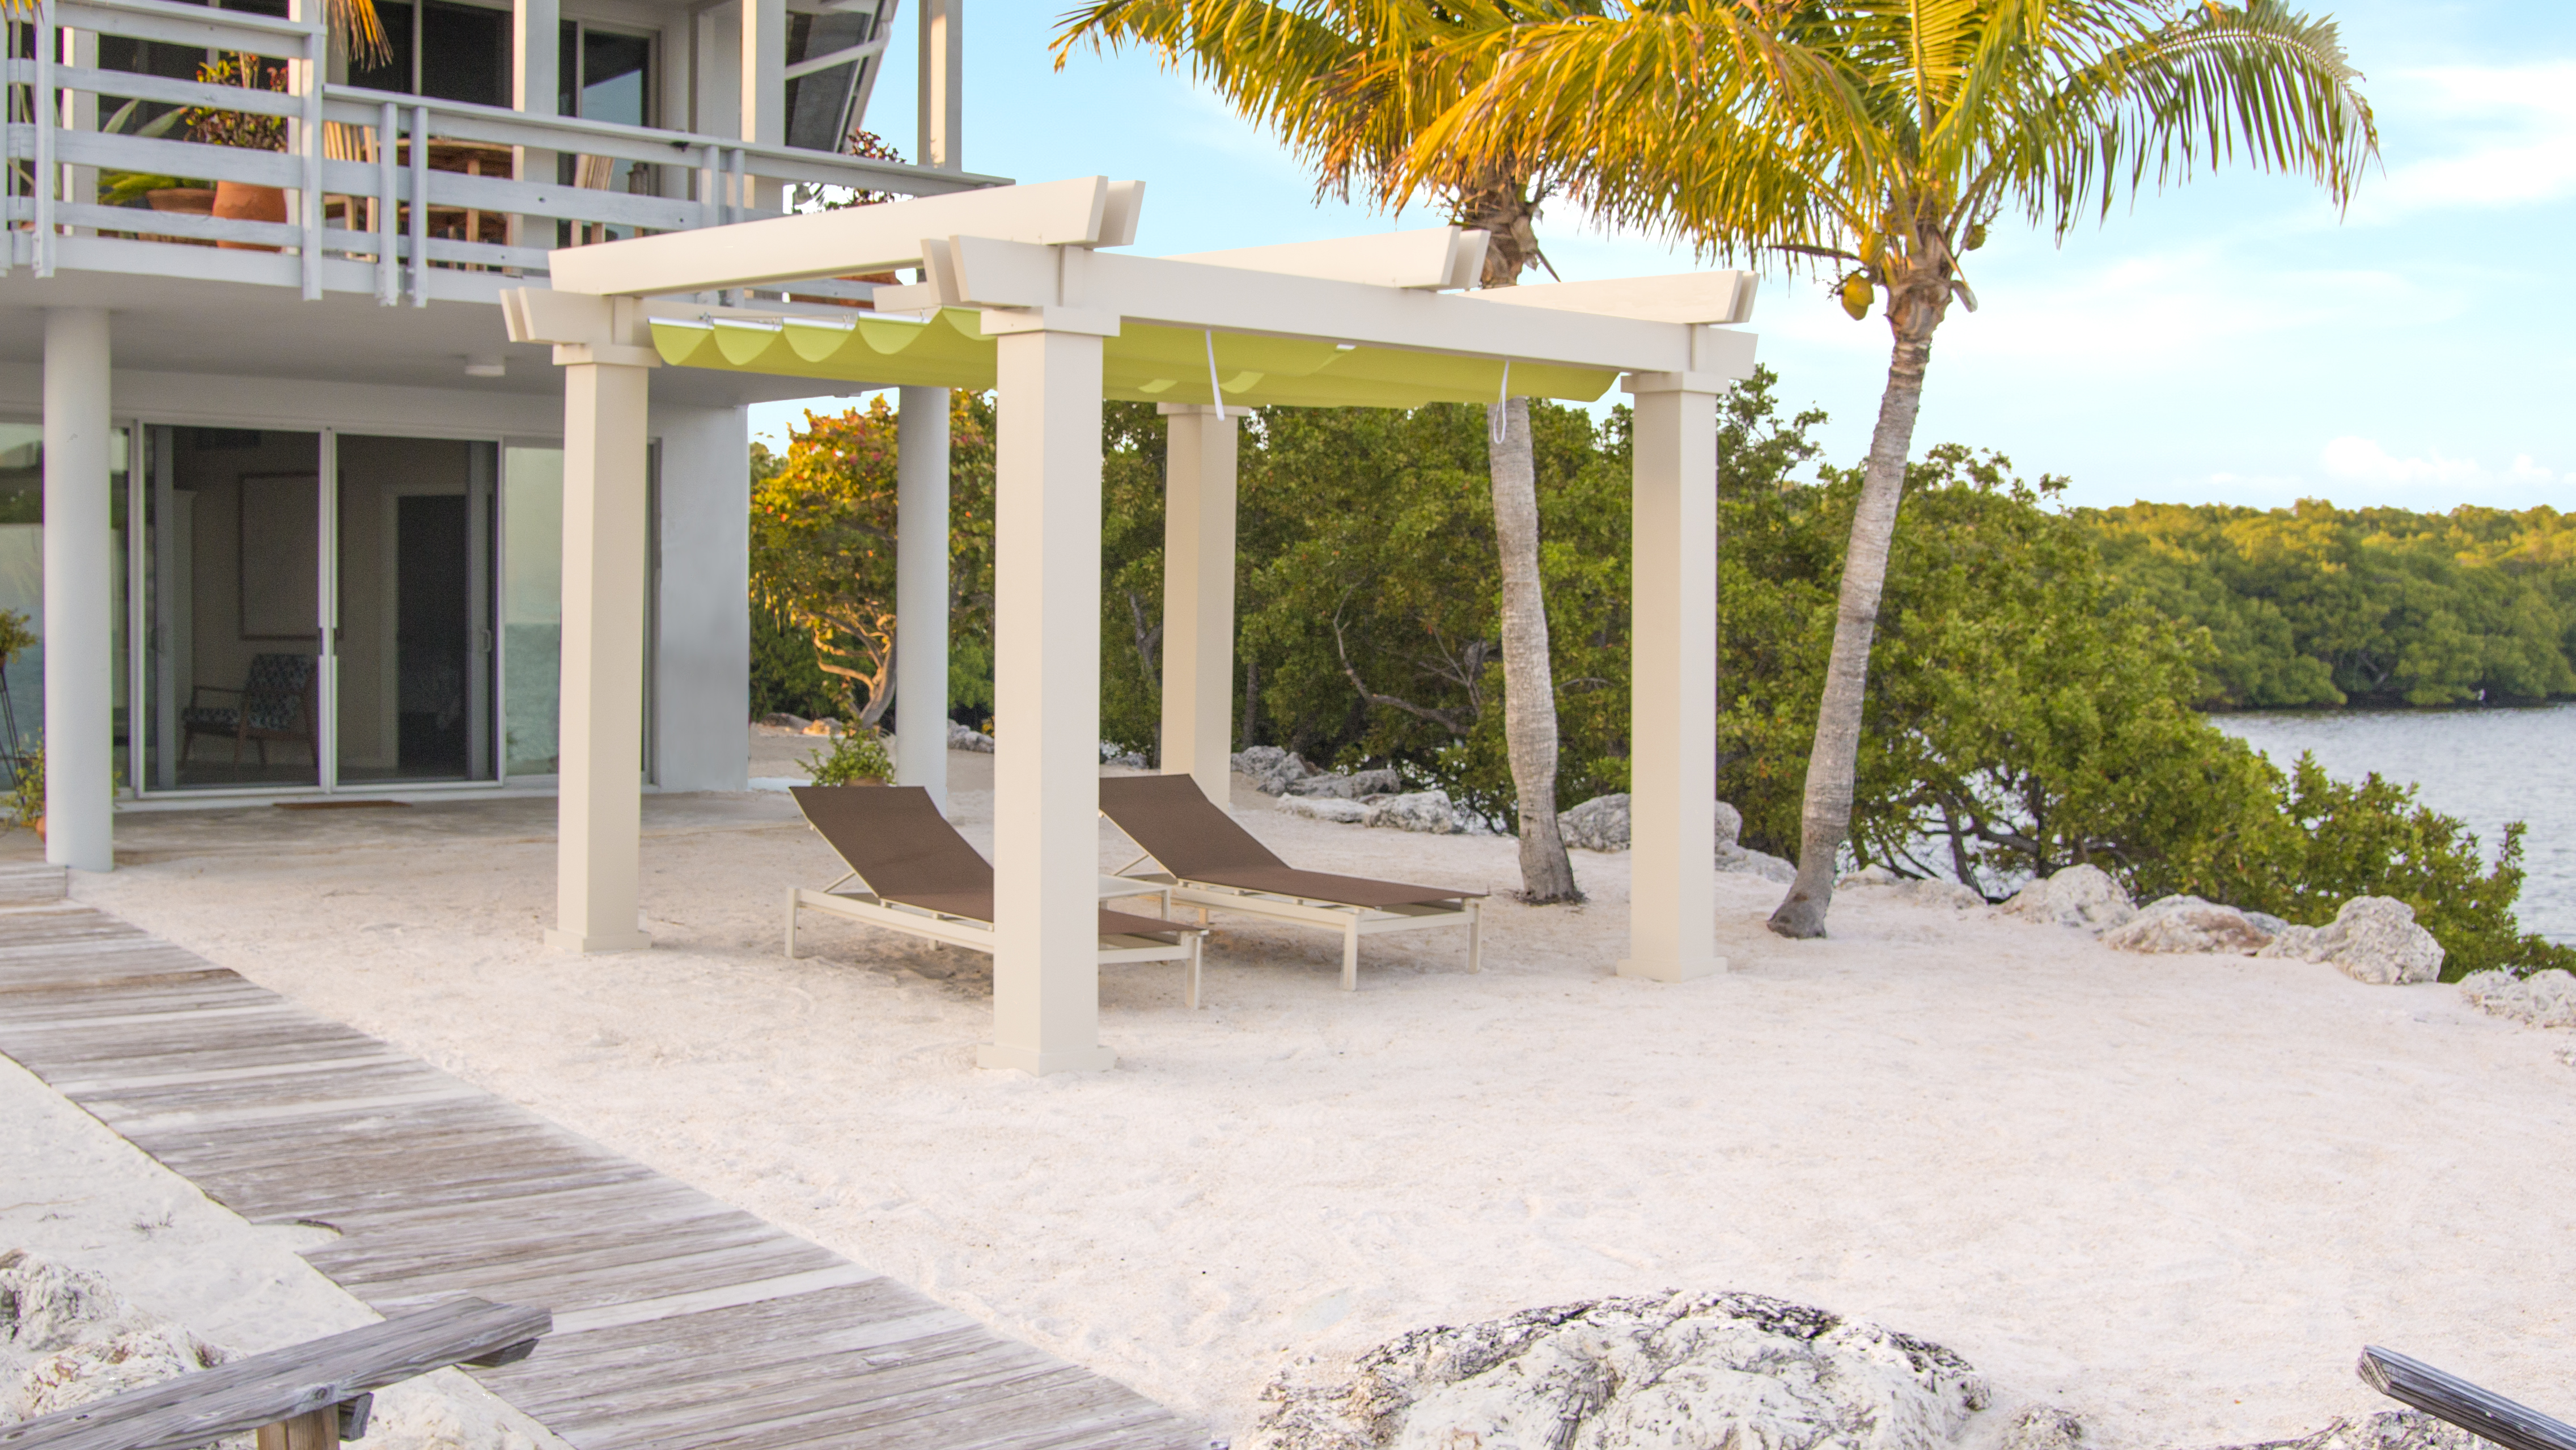 Havana Fiberglass Pergola Kit With Retractable Canopy